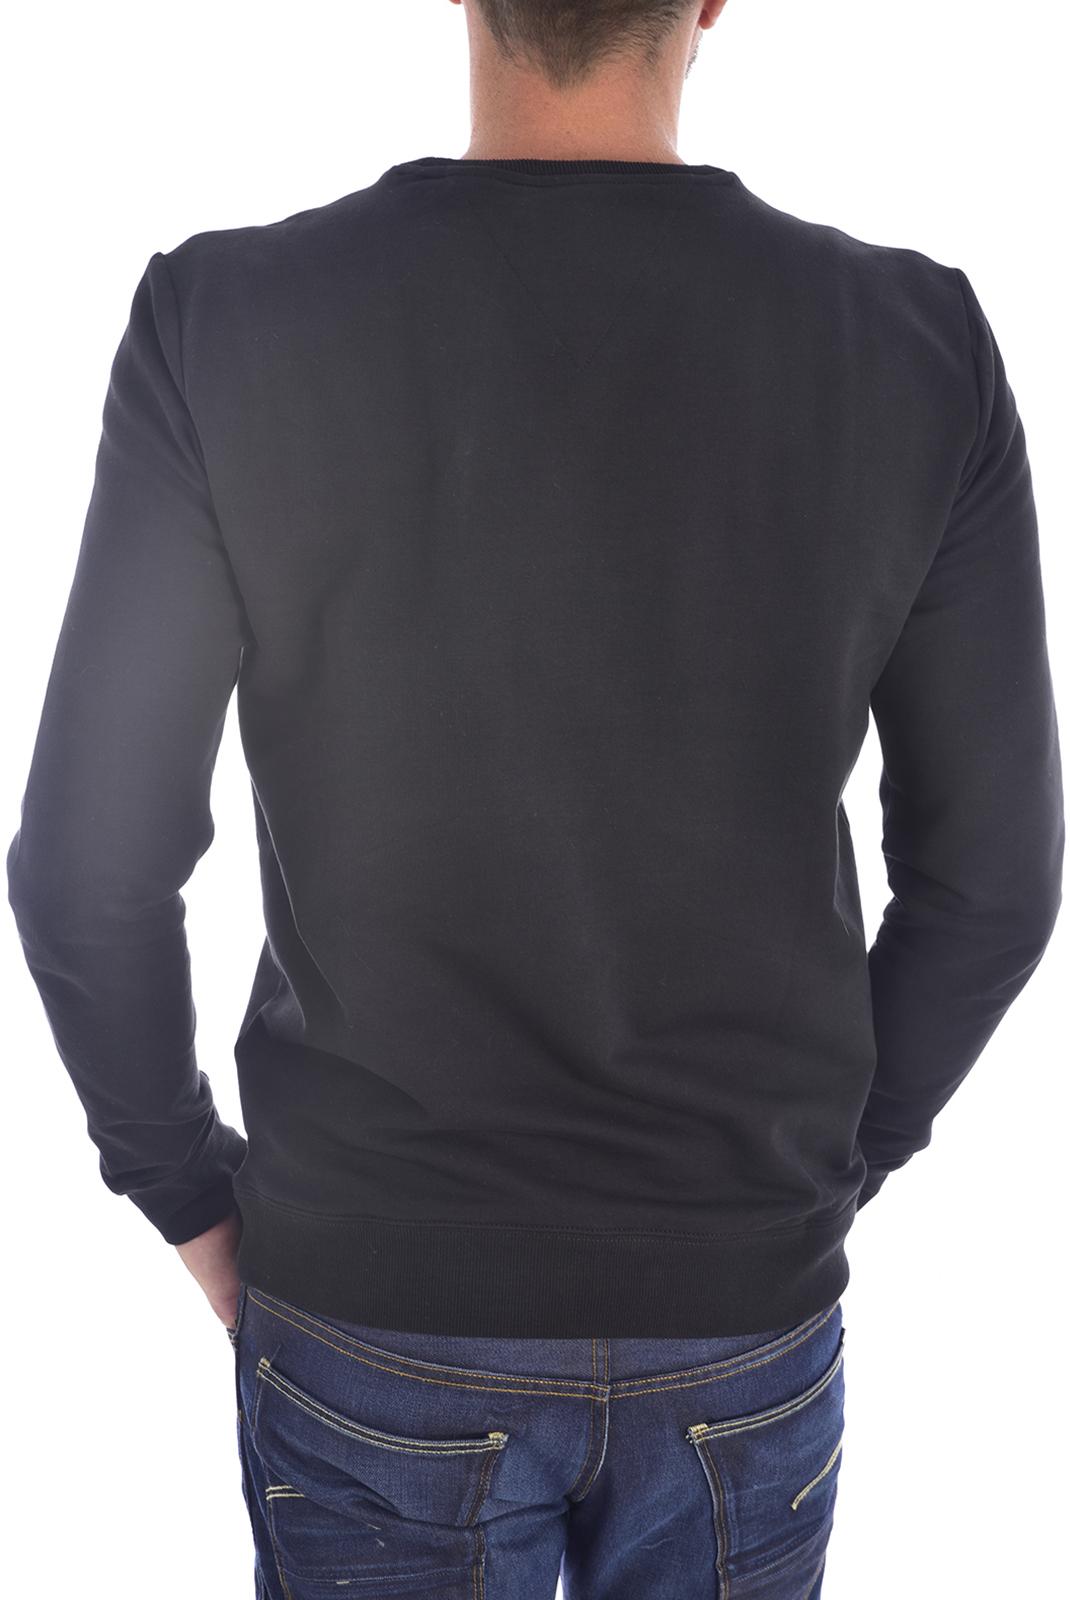 Pulls & Gilets  Guess jeans M94Q24 K7ON0 Jet Black A996